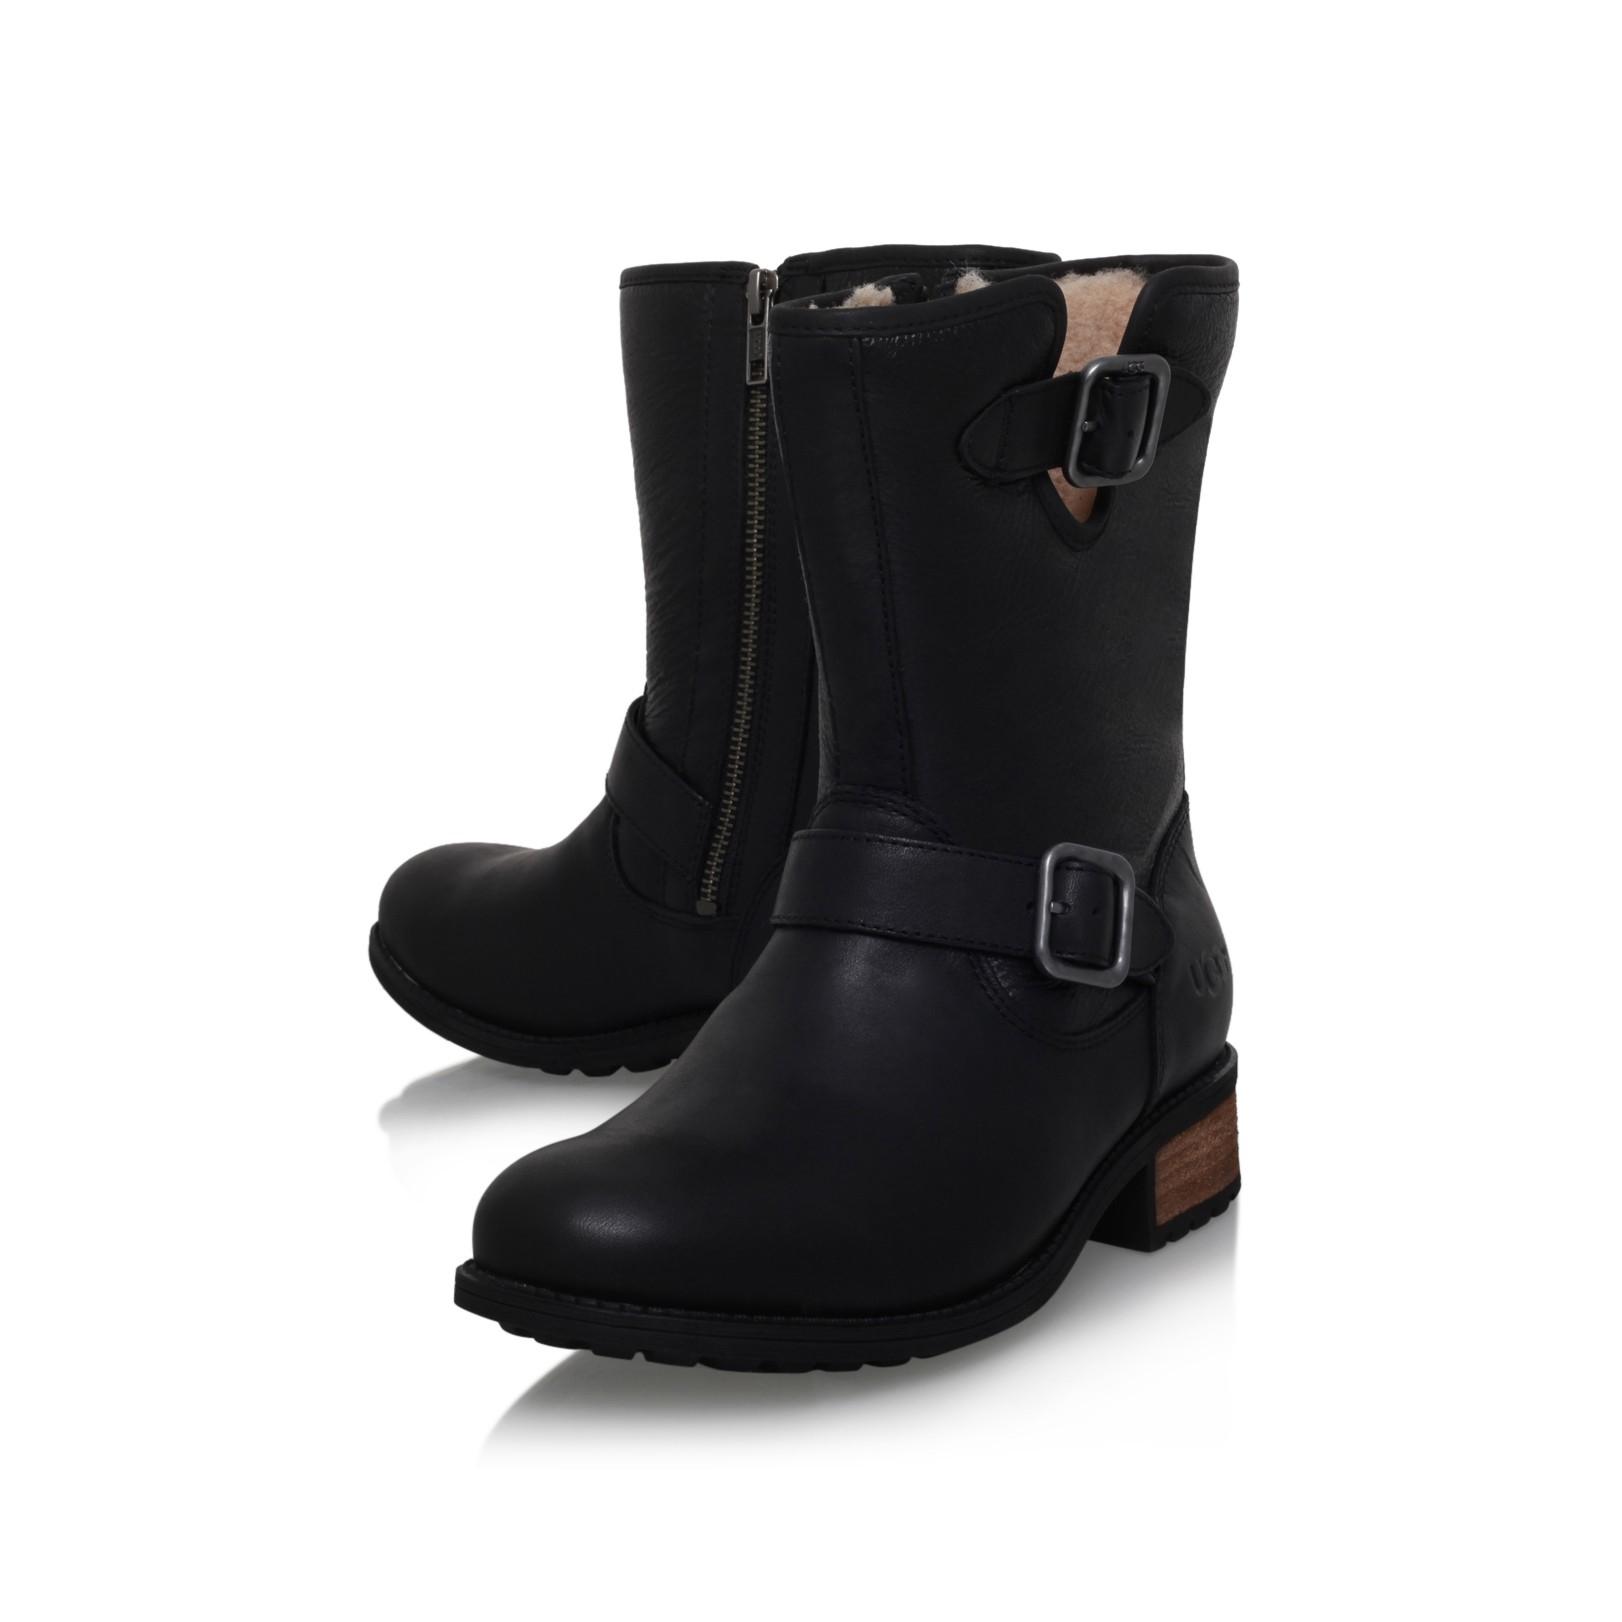 ugg australia women's beckham boot